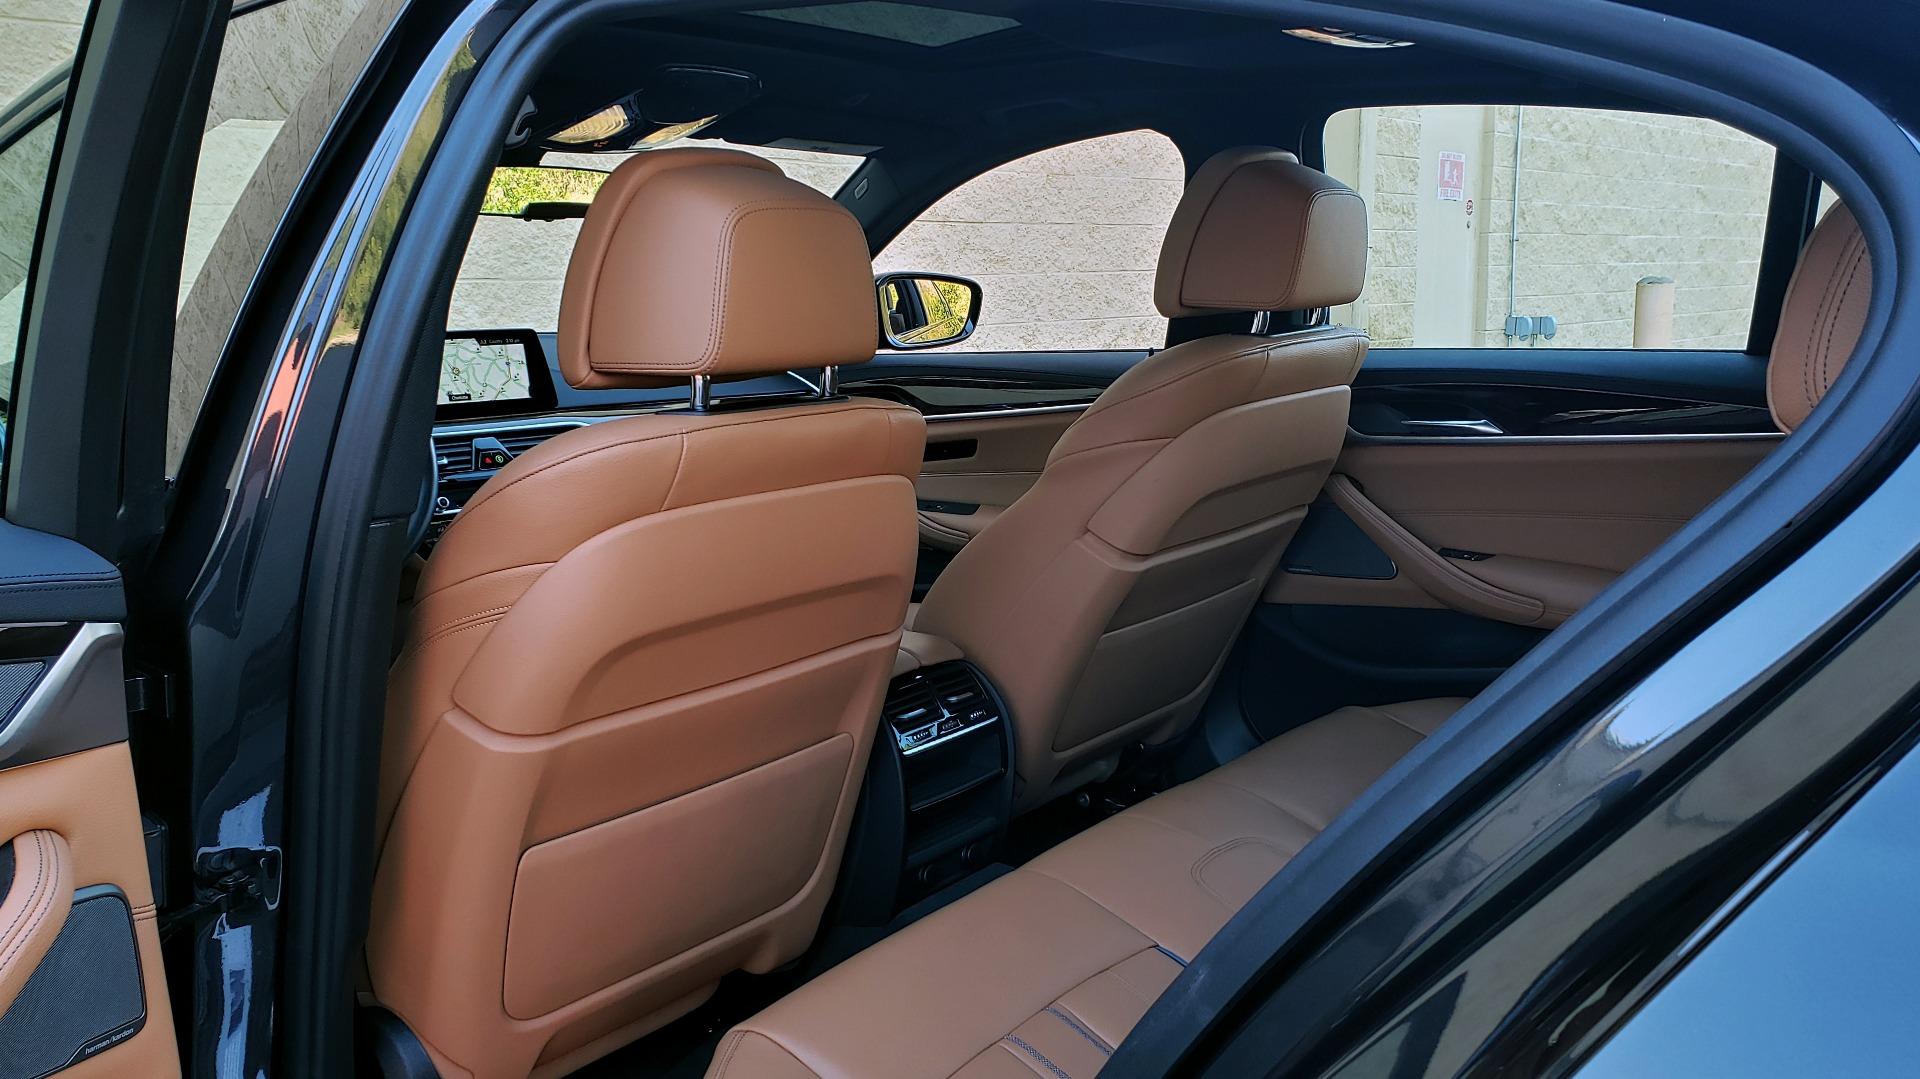 Used 2018 BMW 5 SERIES 540I M-SPORT / DRVR ASST / EXEC PKG / NAV / SUNROOF / HUD / REARVIEW for sale Sold at Formula Imports in Charlotte NC 28227 63